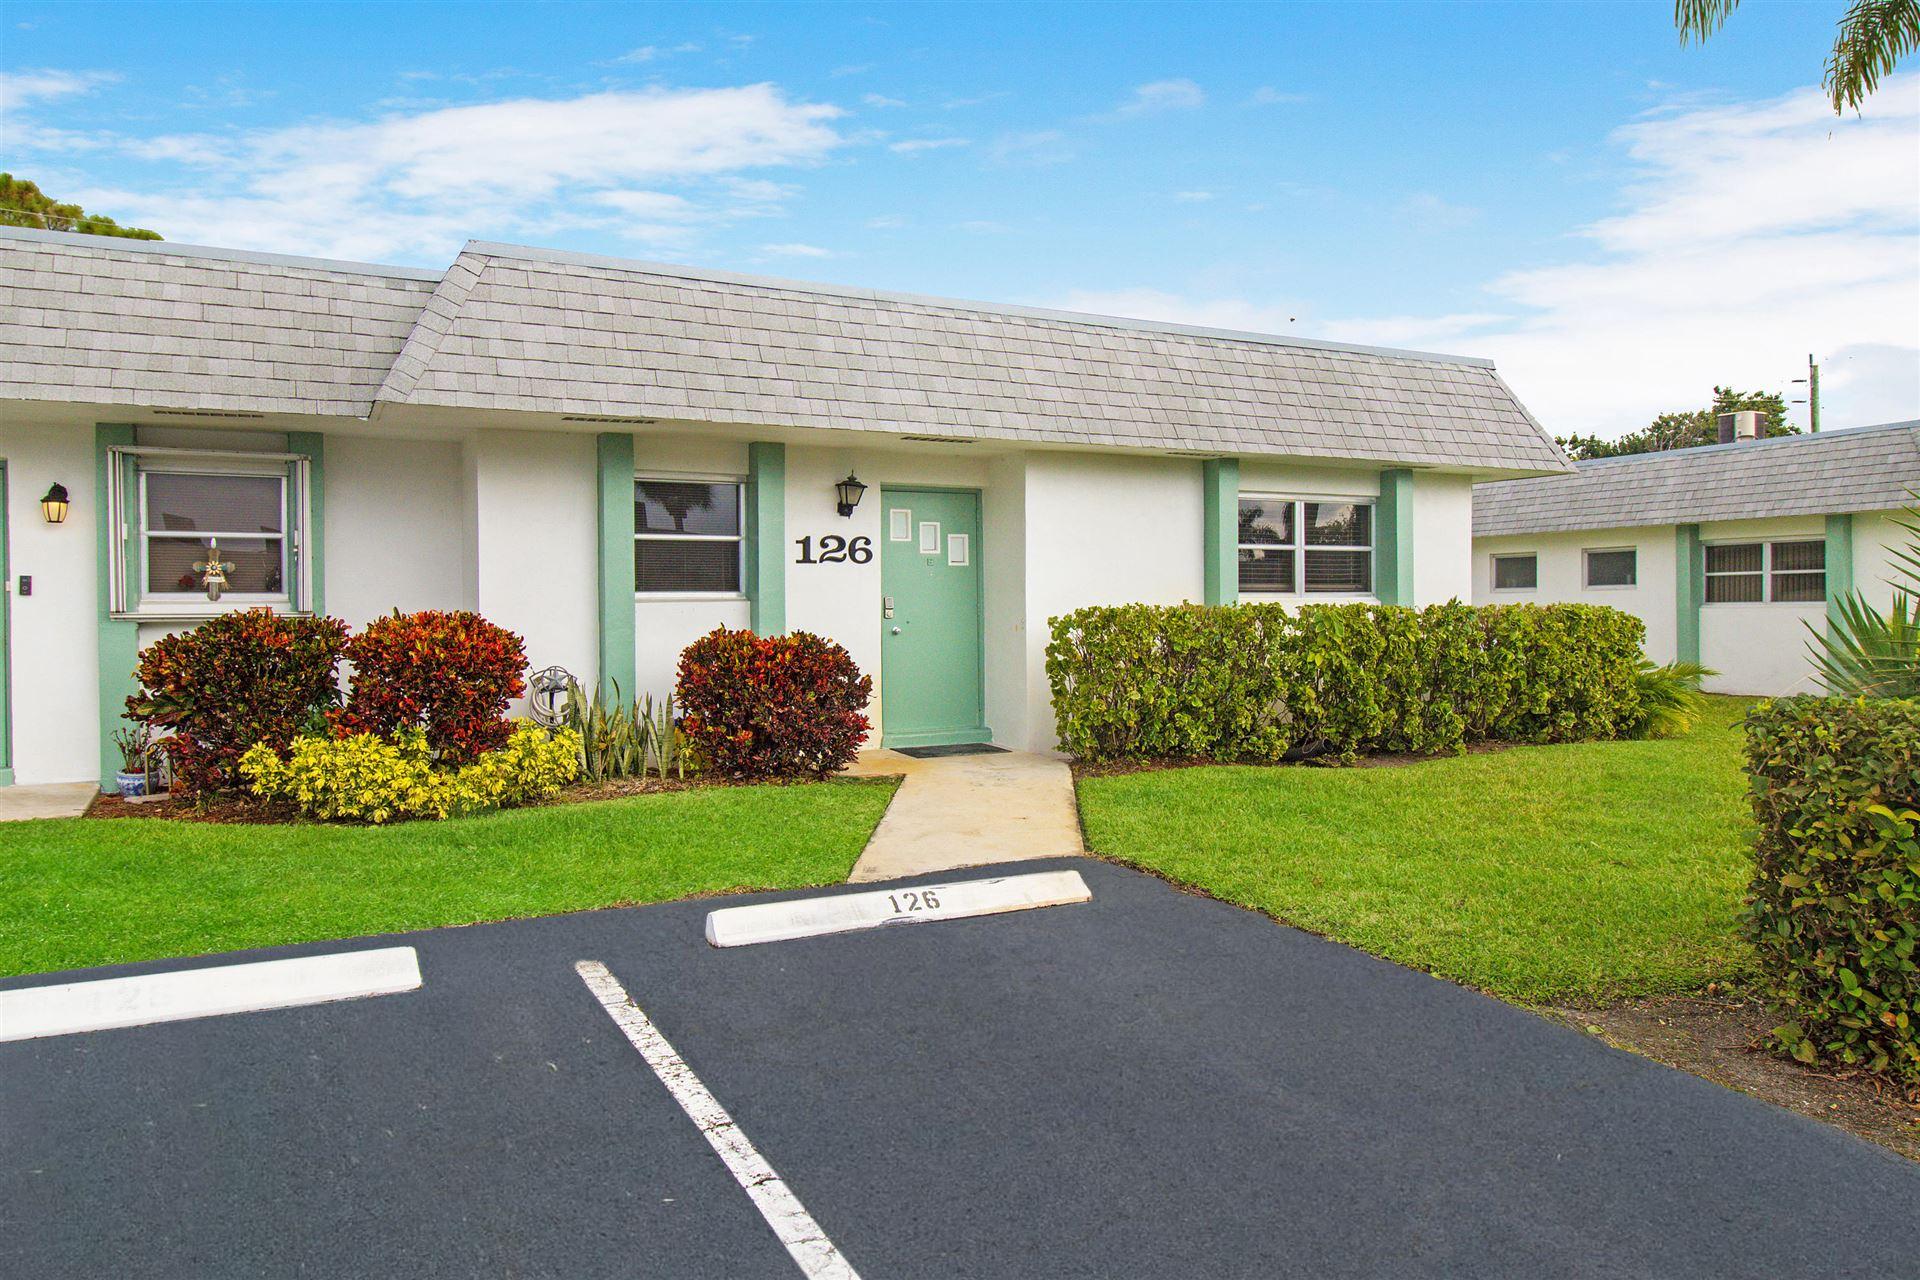 2638 Gately Drive E #126, West Palm Beach, FL 33415 - #: RX-10632486